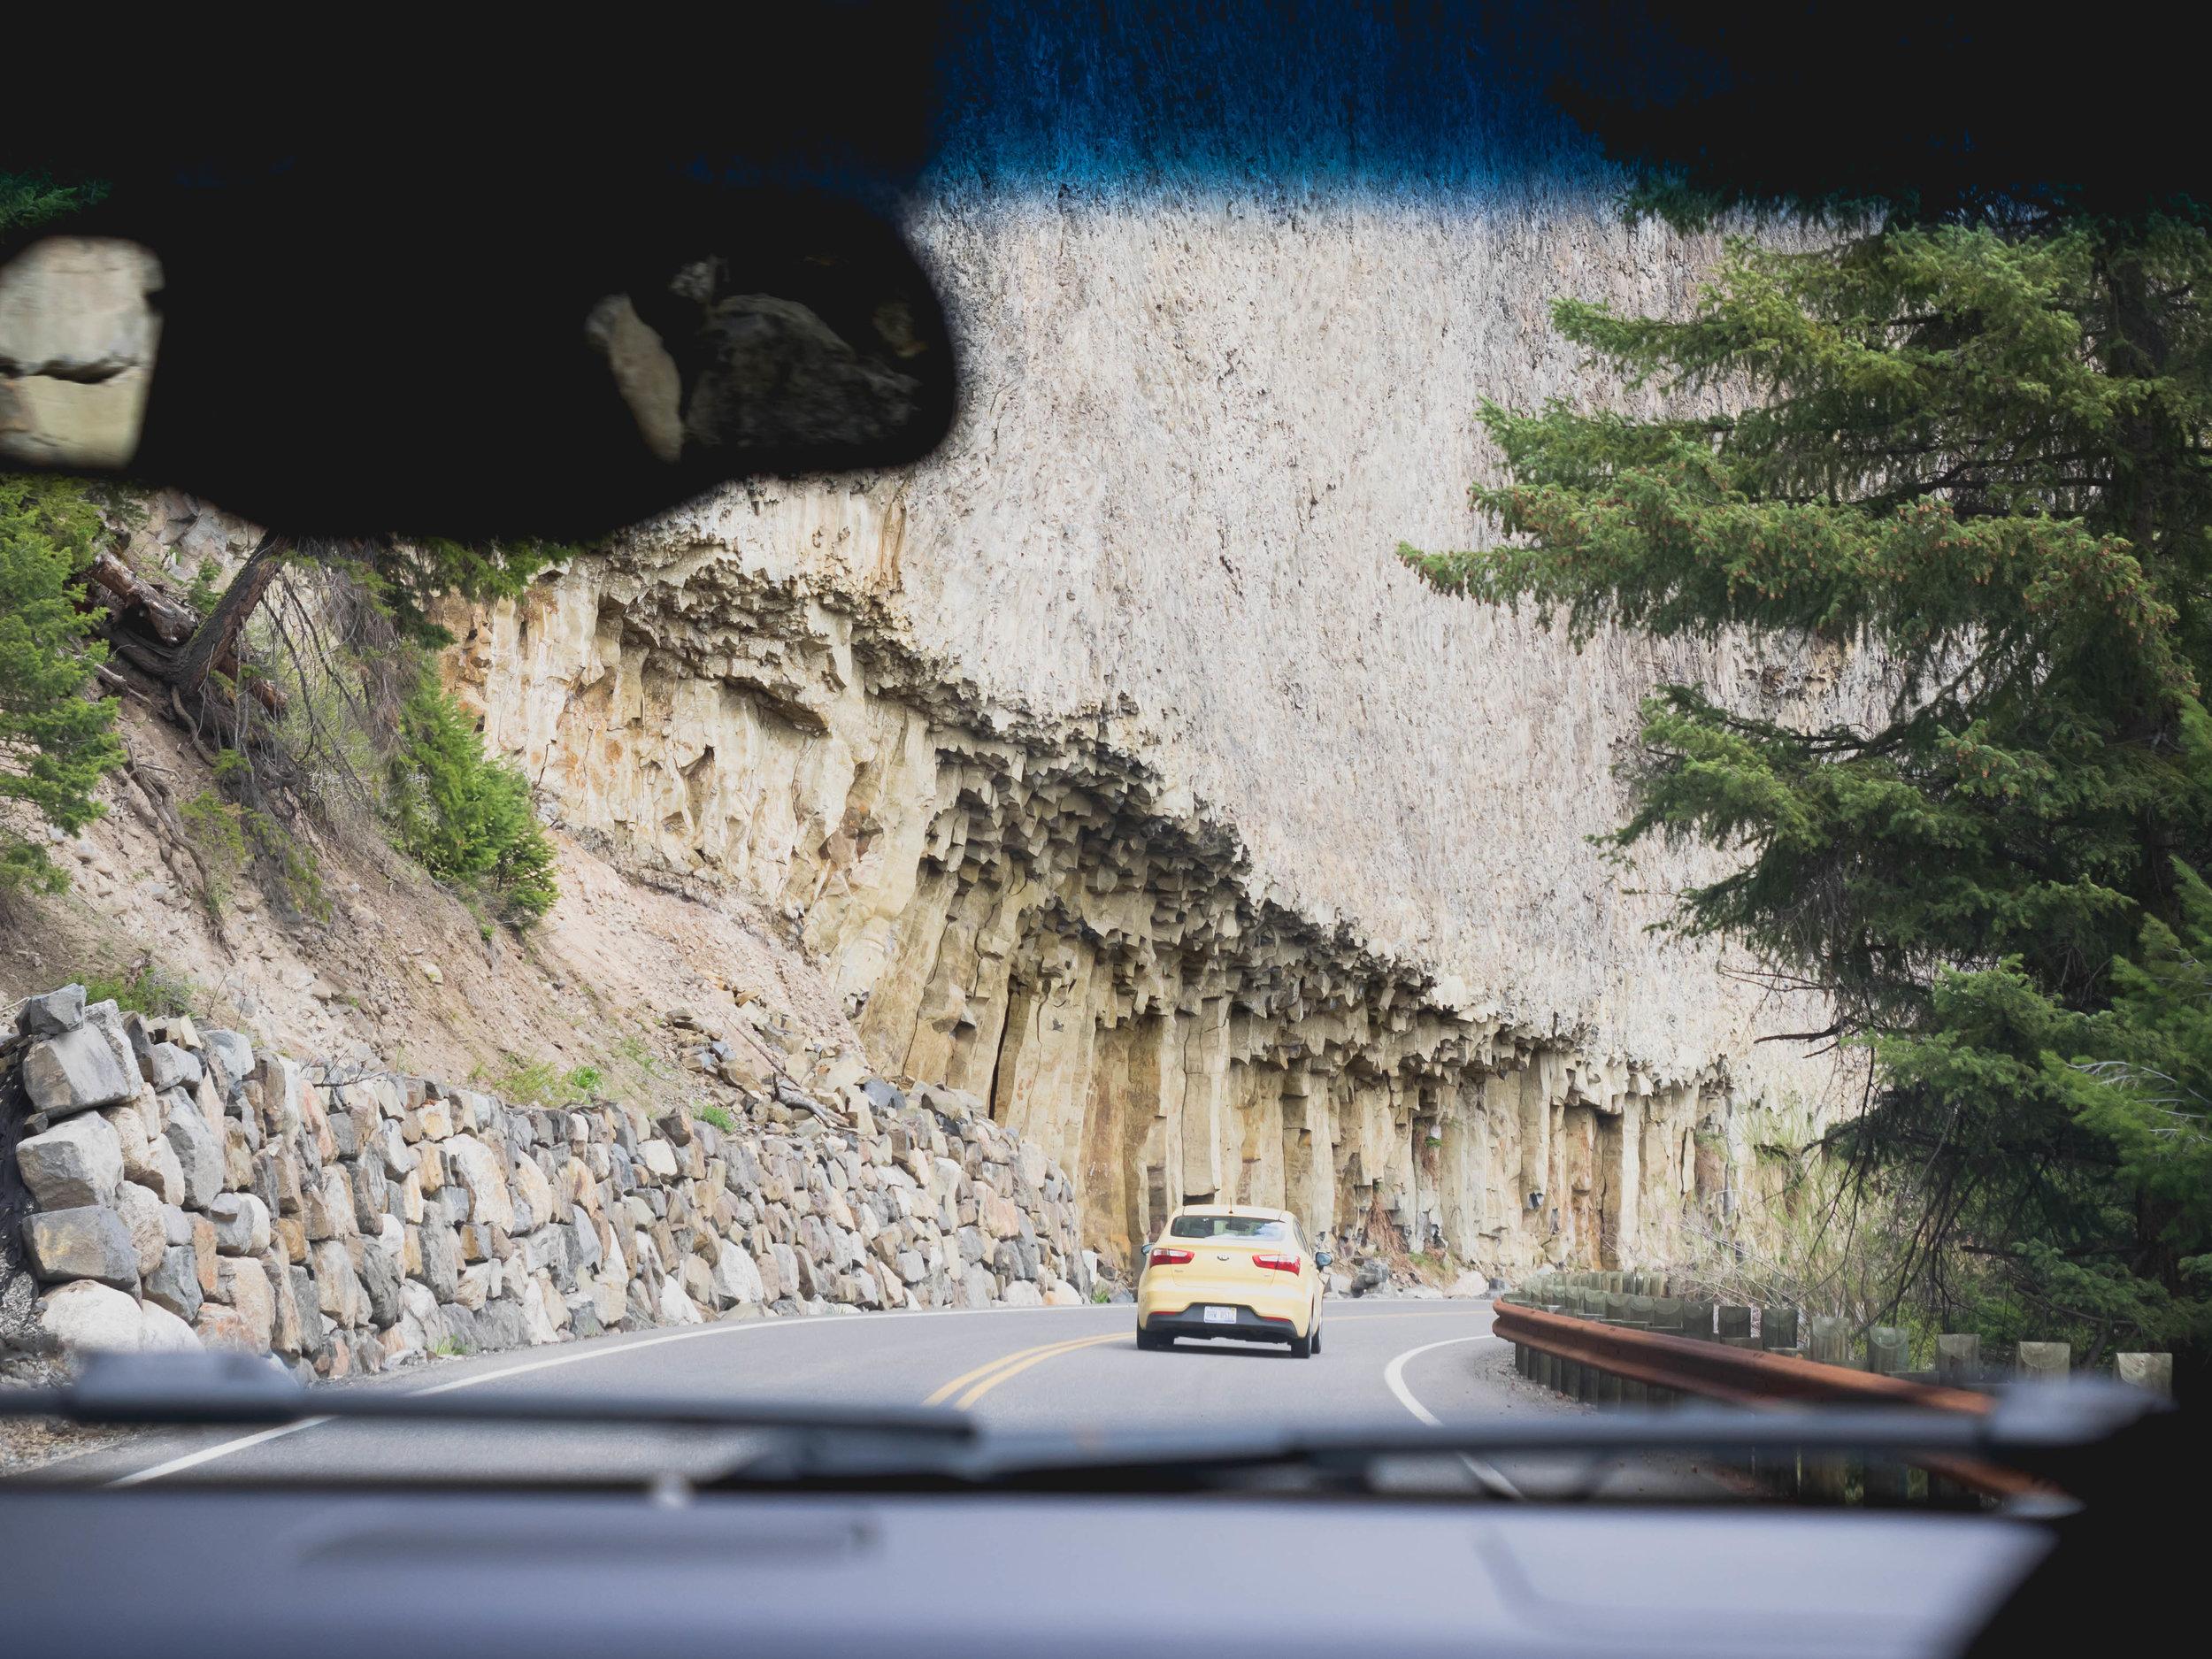 driving past giant basalt columns.